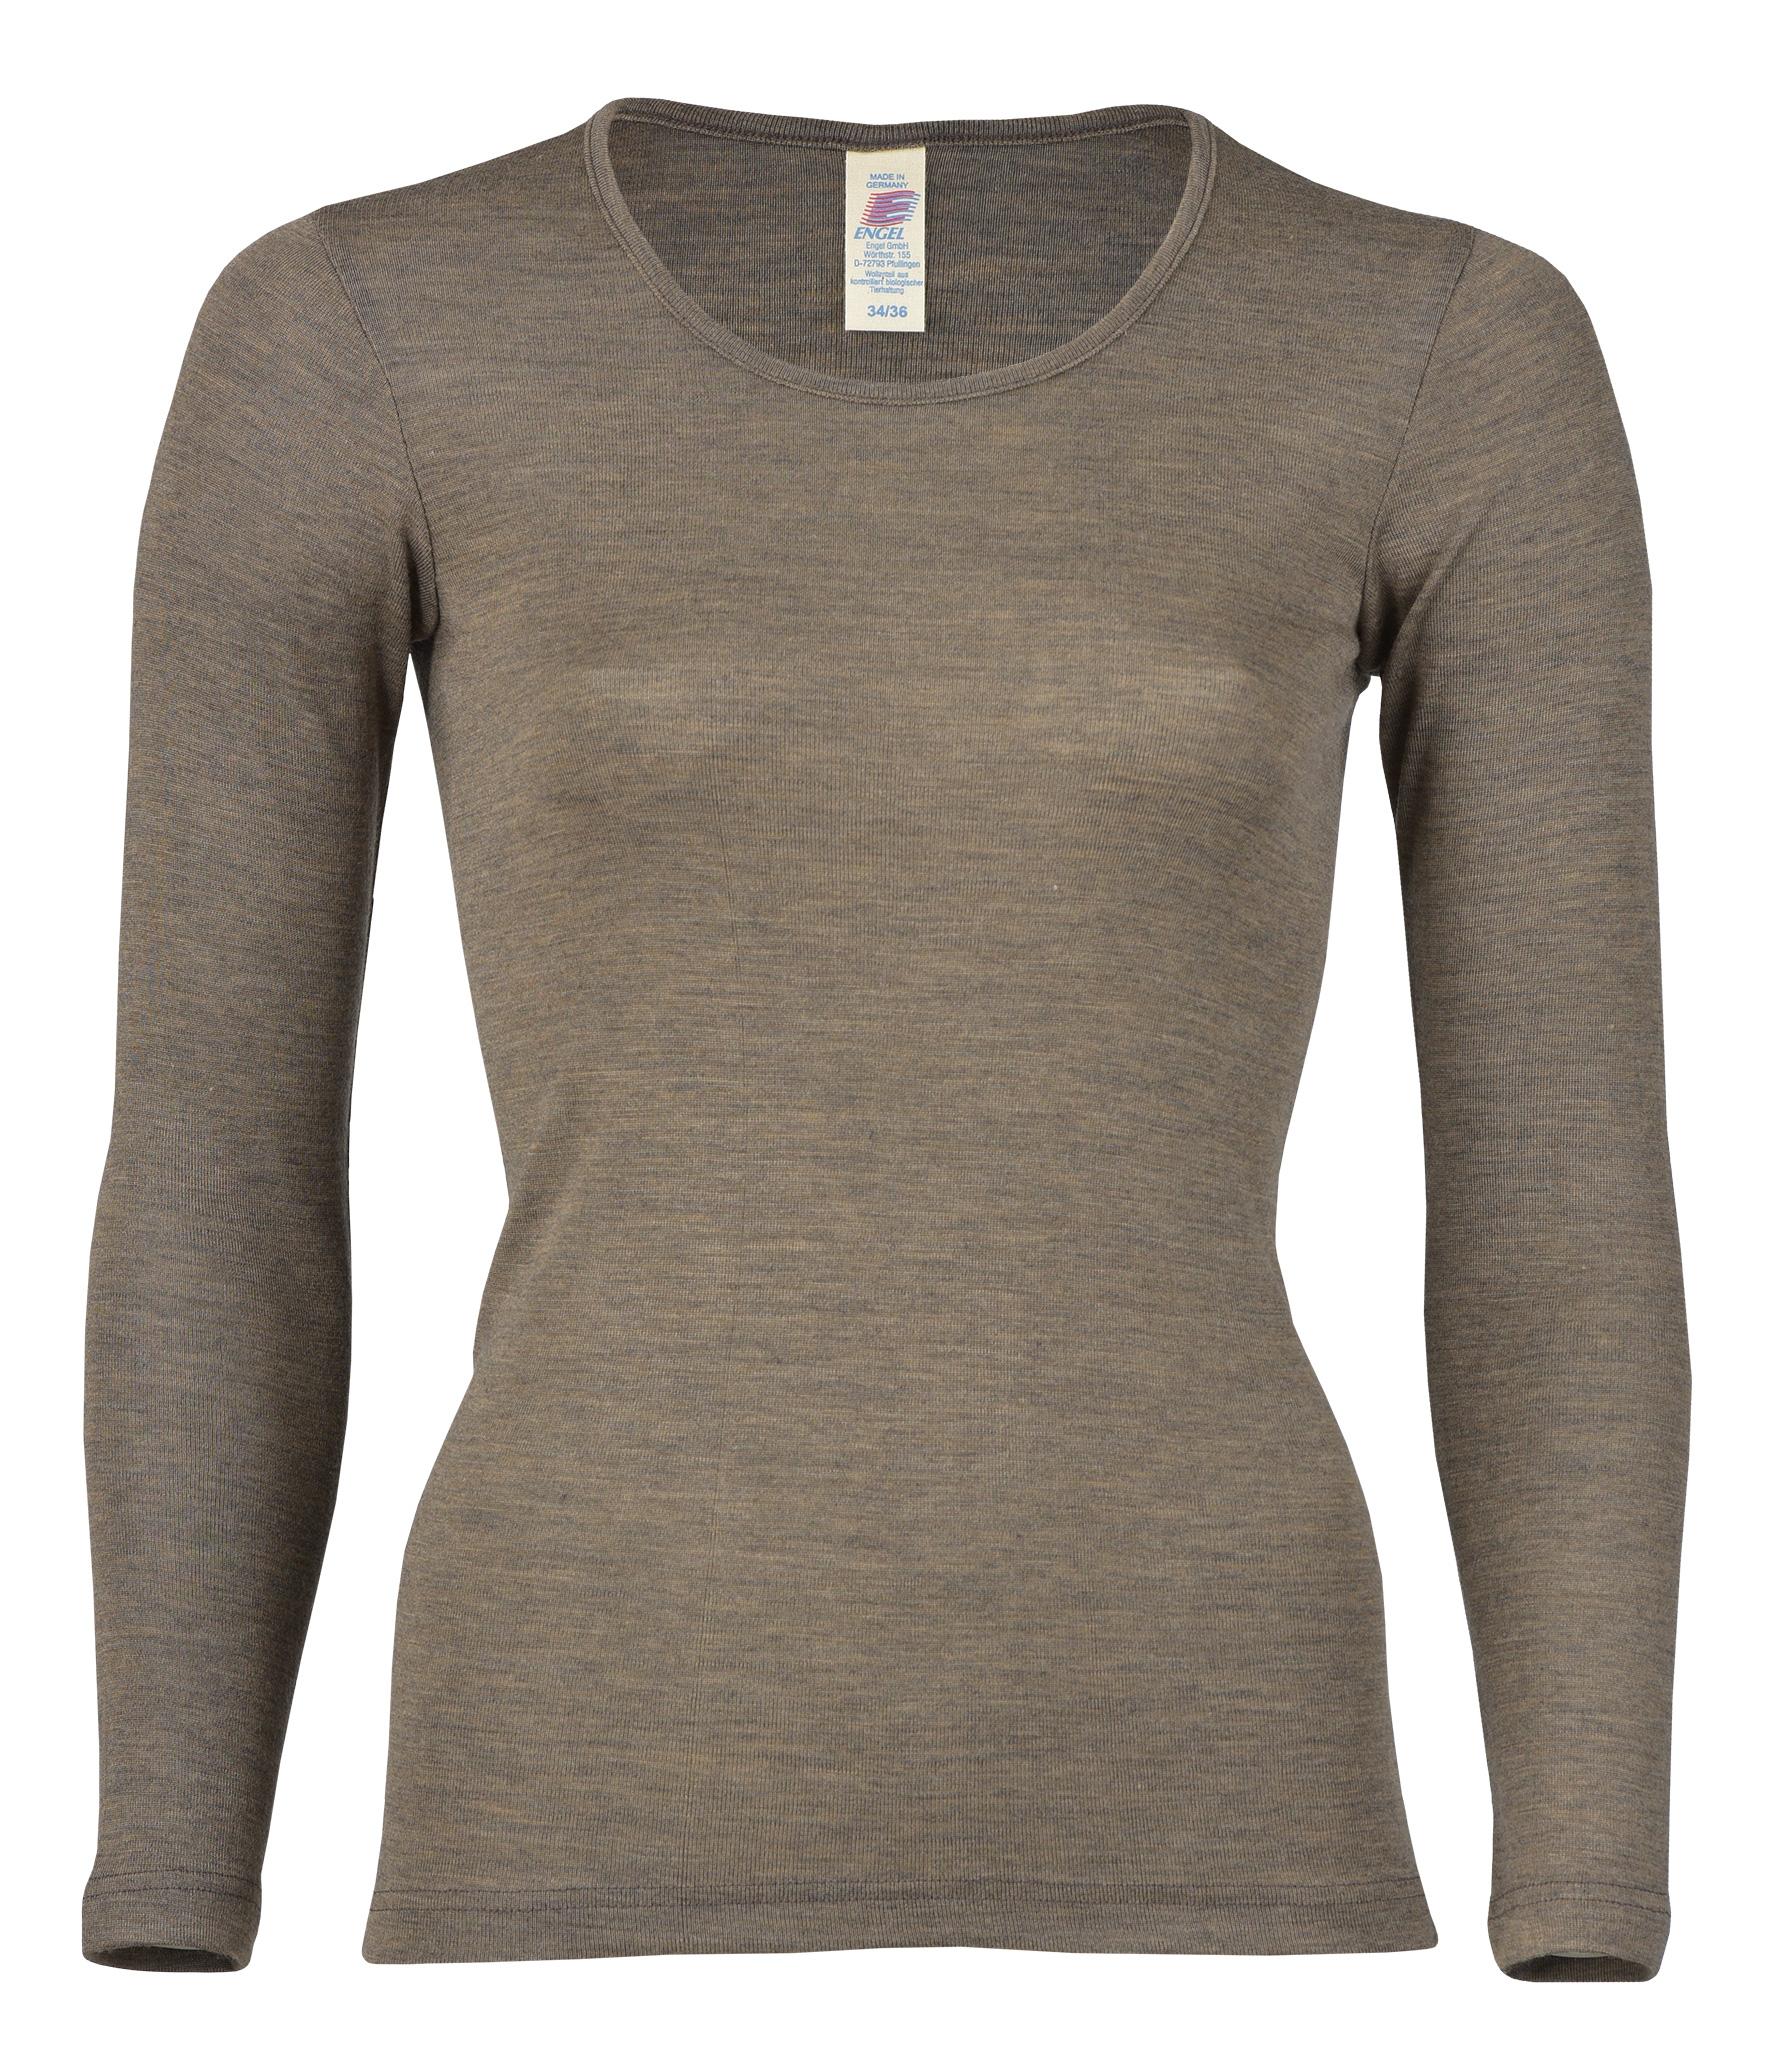 Camiseta Mujer Engel, Lana Merino y Seda, Walnut